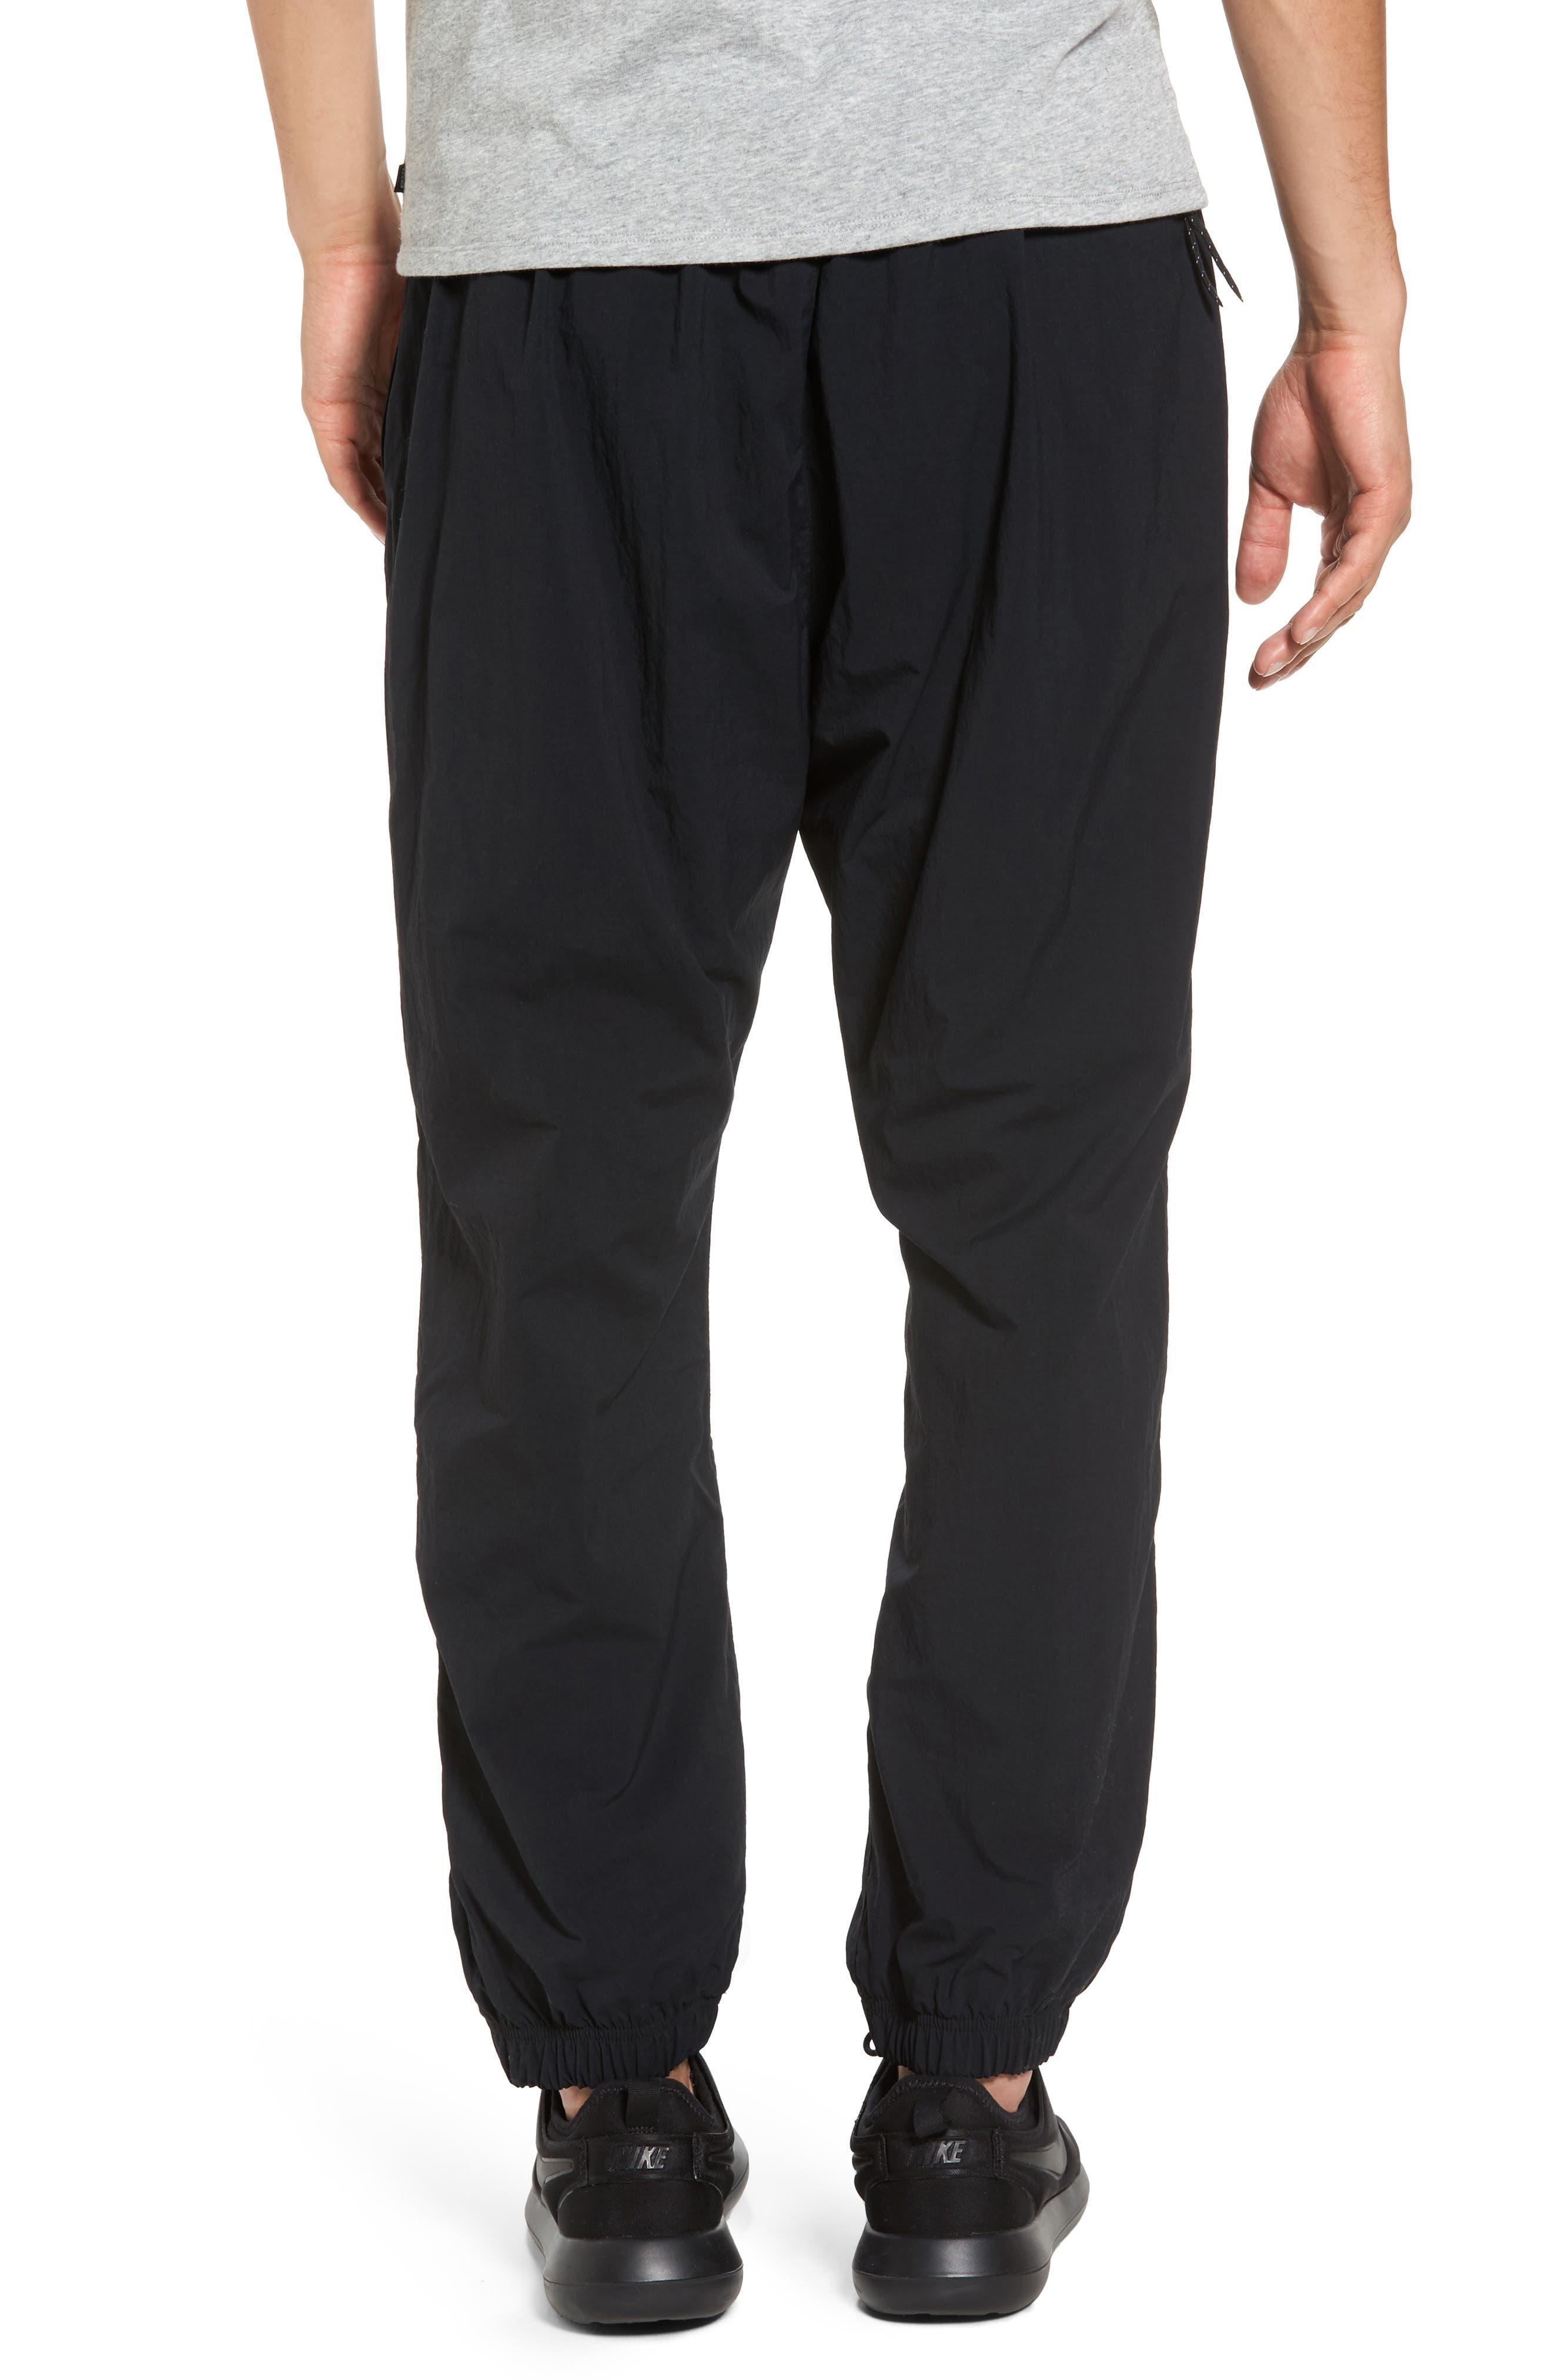 Flex Woven Pants,                             Alternate thumbnail 2, color,                             Black/ White